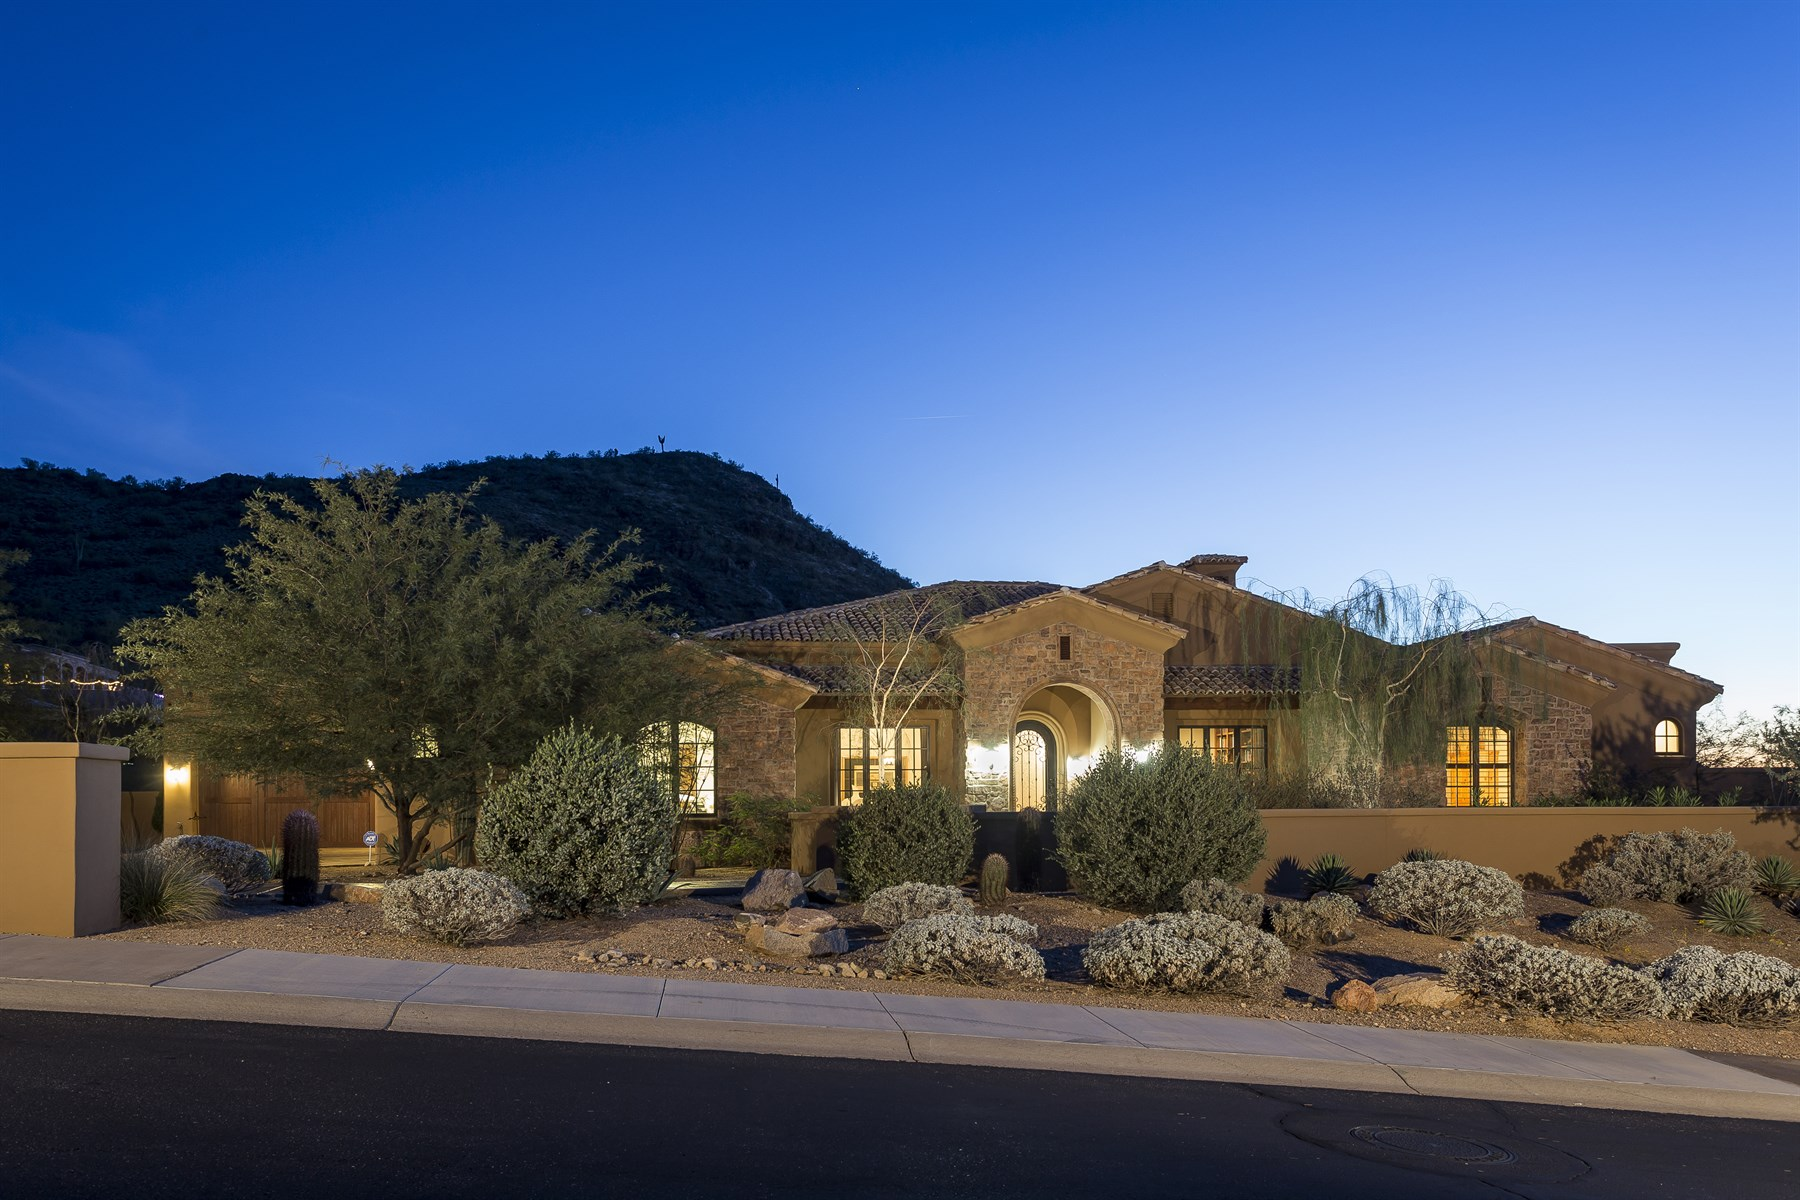 Частный односемейный дом для того Продажа на Nestled among gorgeous mountain and expansive city light views 14235 E Kalil Dr Scottsdale, Аризона 85259 Соединенные Штаты